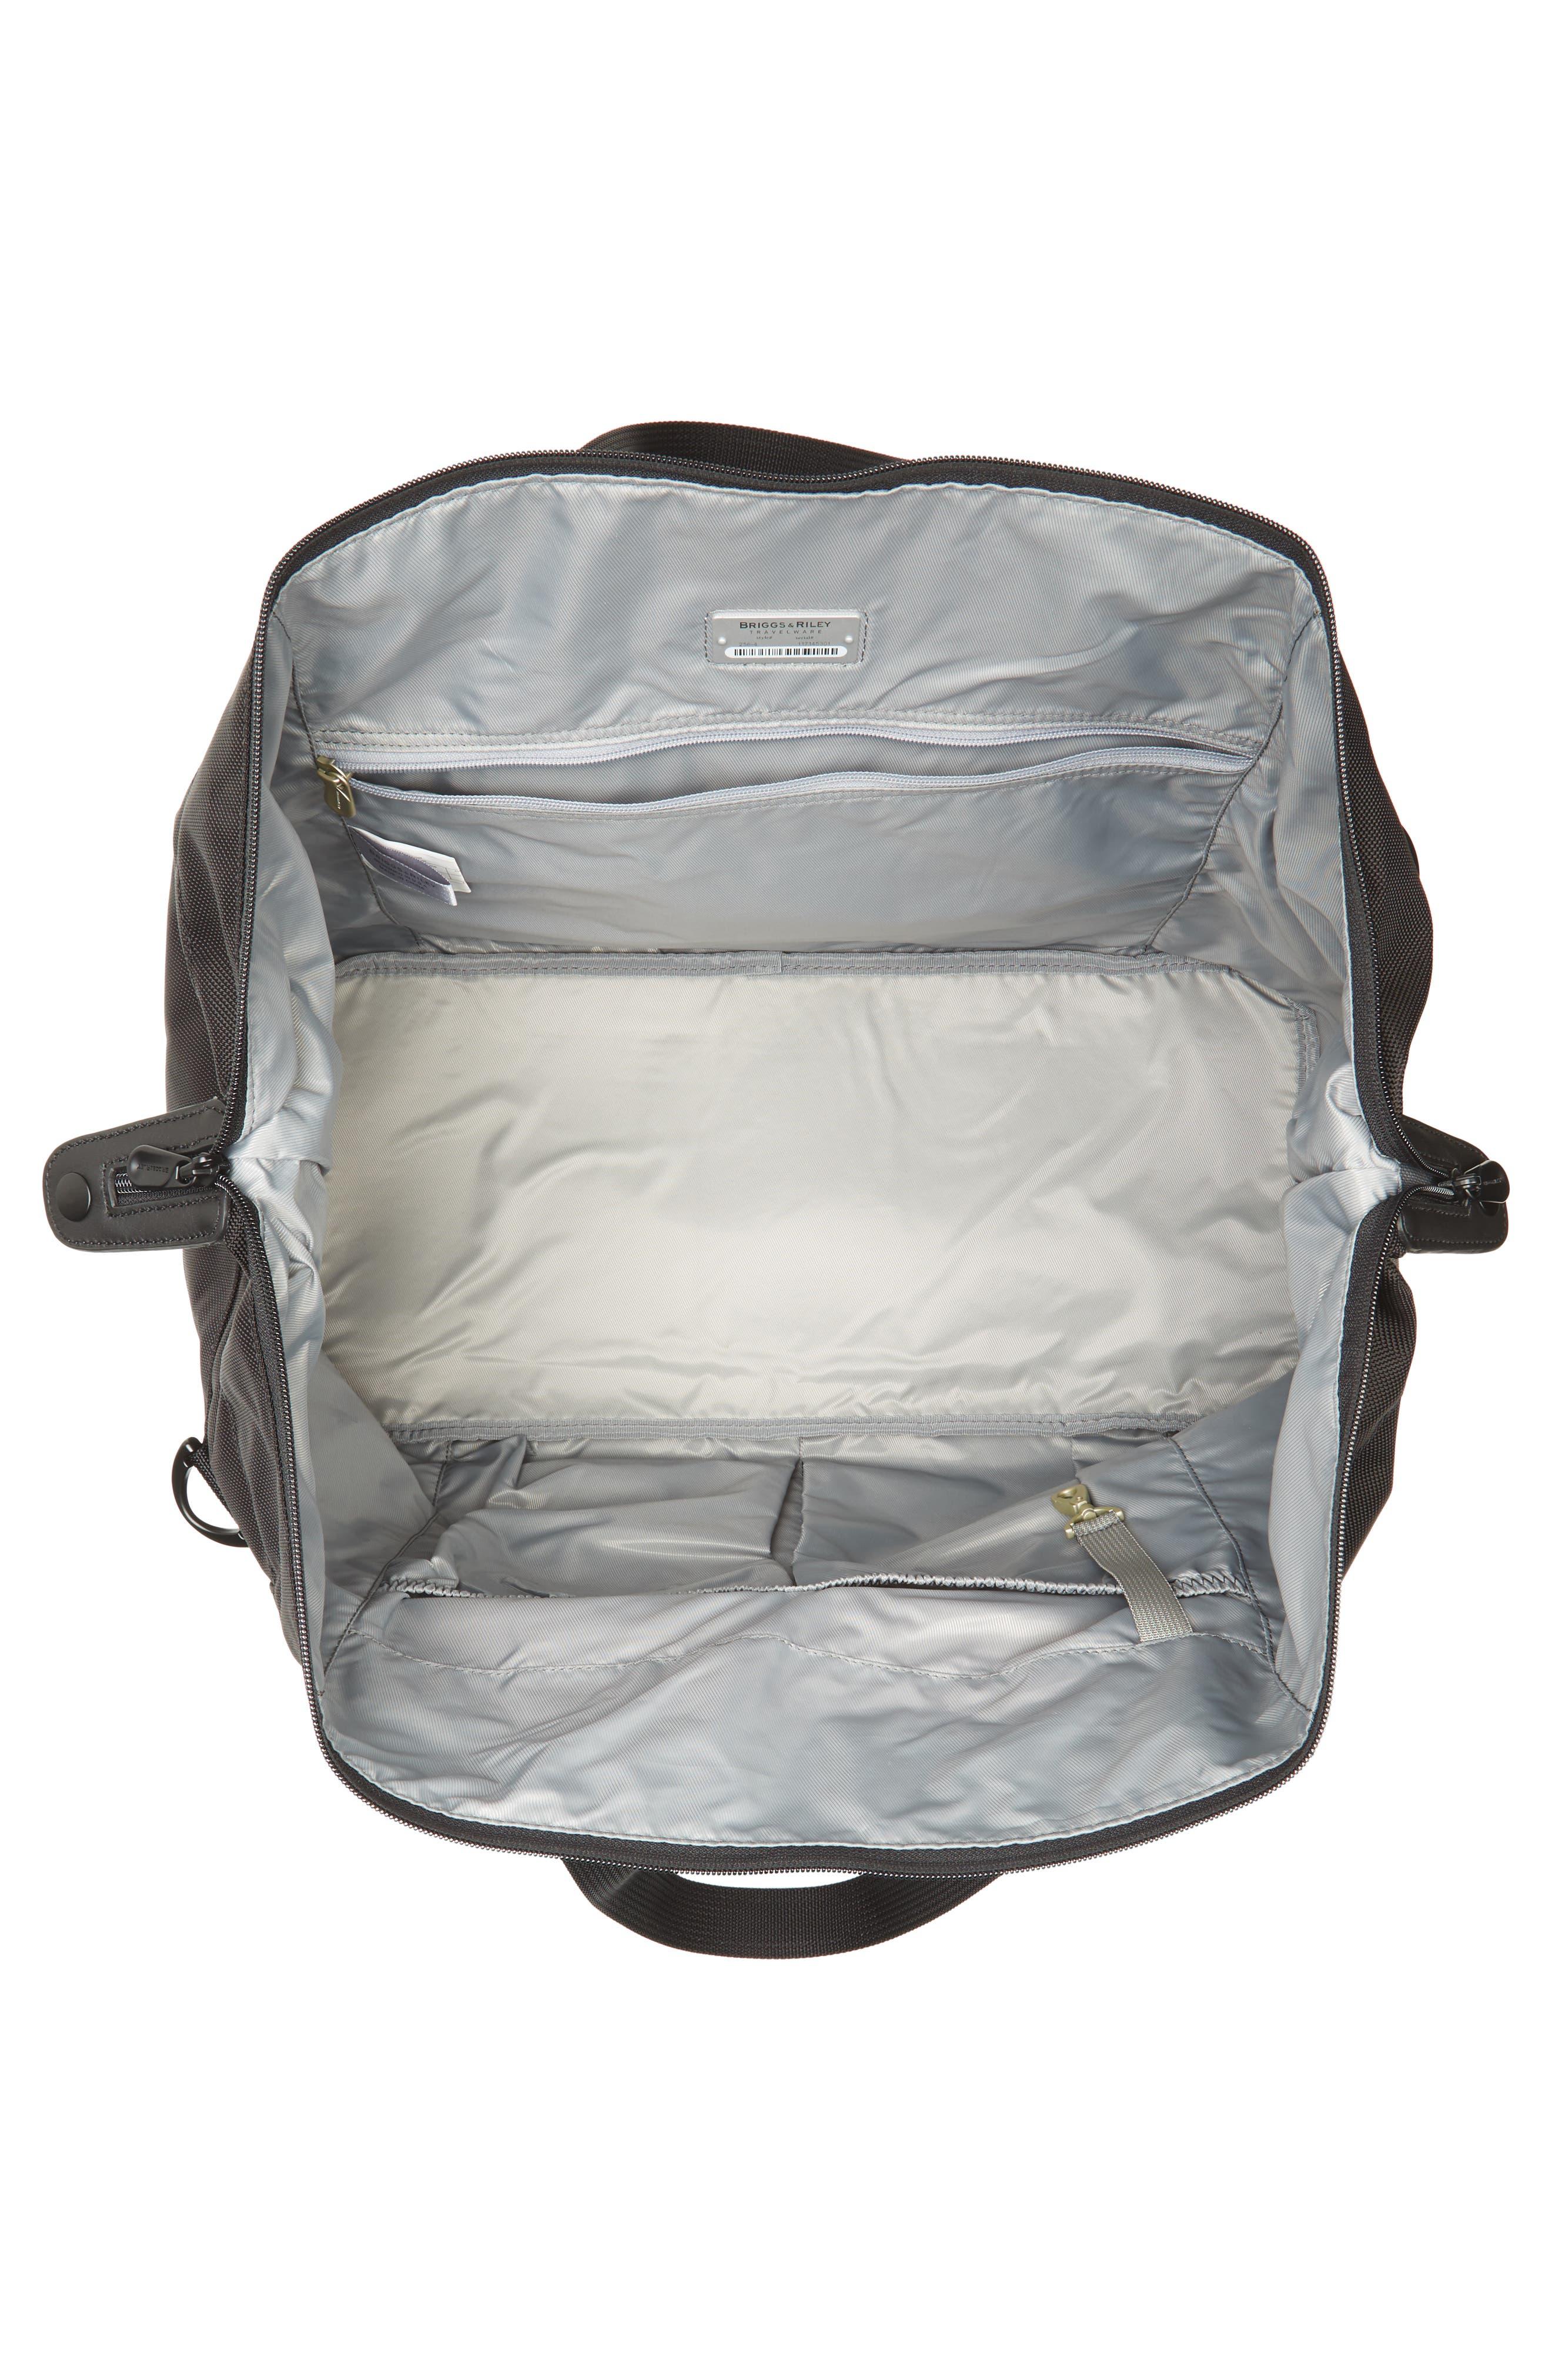 BRIGGS & RILEY,                             'Baseline' Duffel Bag,                             Alternate thumbnail 4, color,                             BLACK